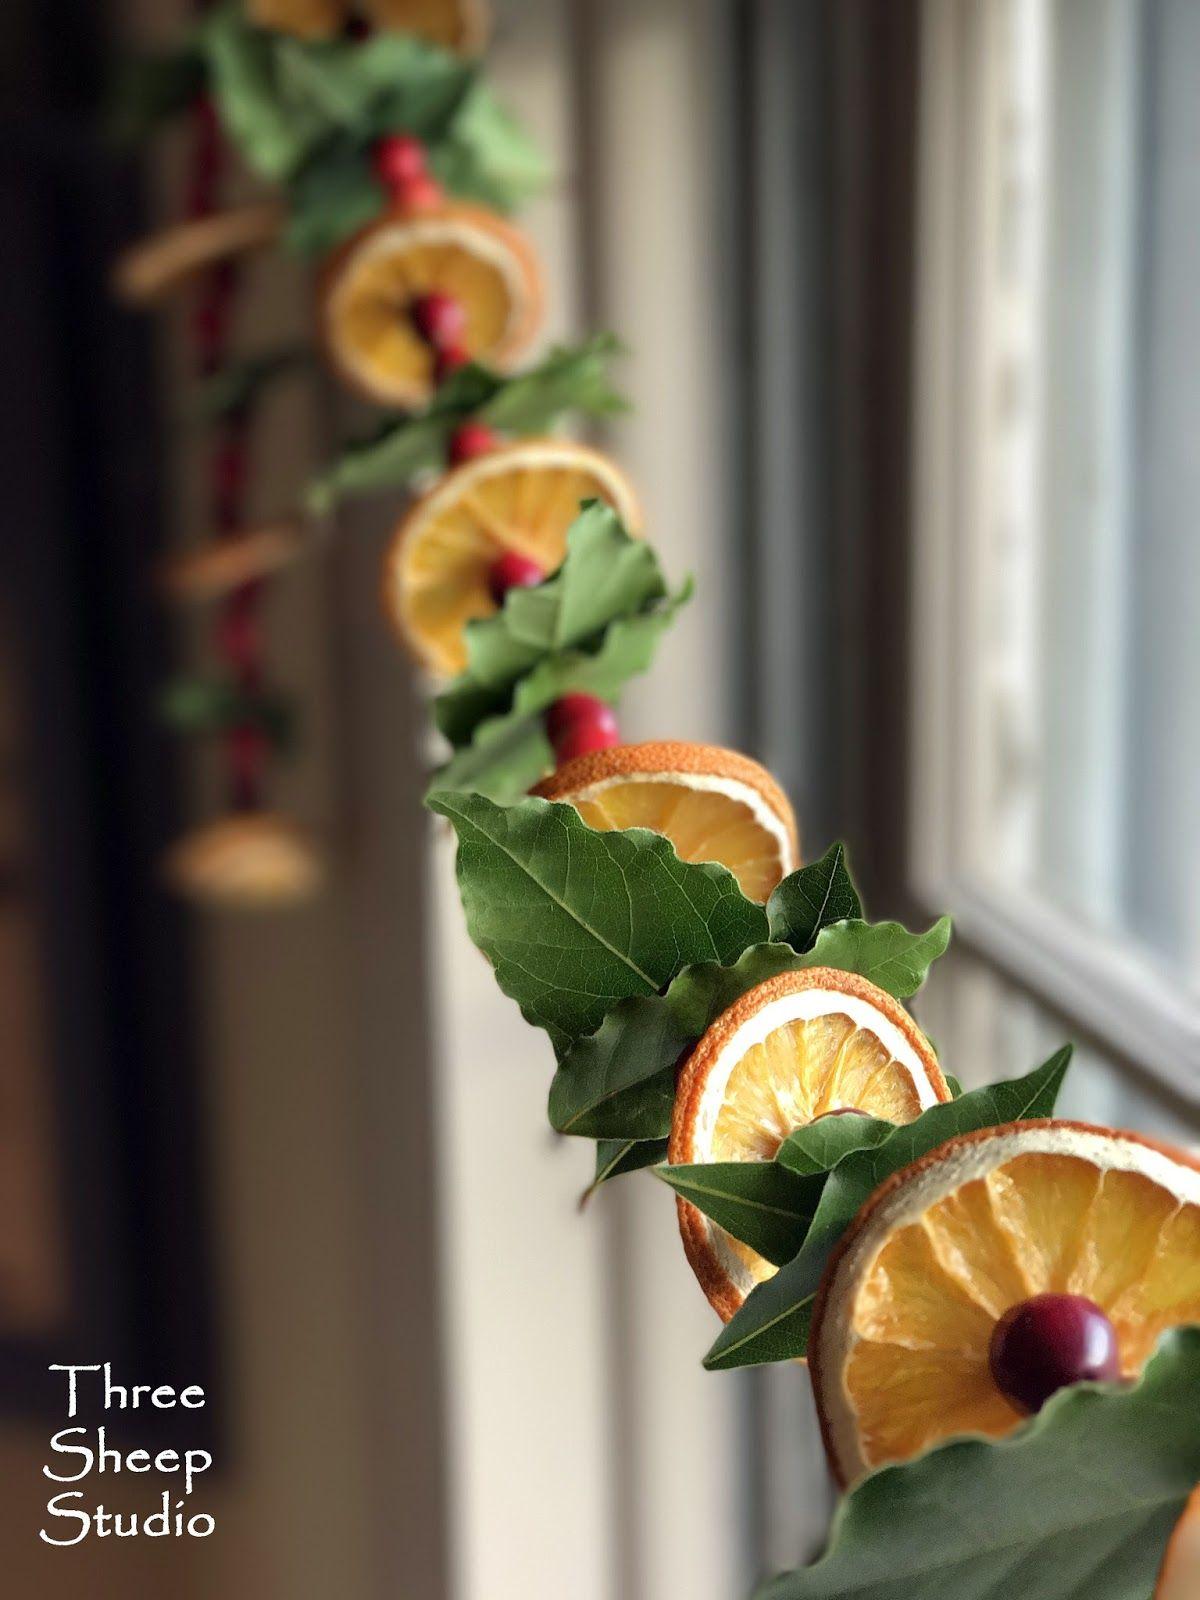 Orange Cranberry And Bay Leaf Garland Threesheepstudio Com Christmas Decorations Christmas Diy Christmas Cheer